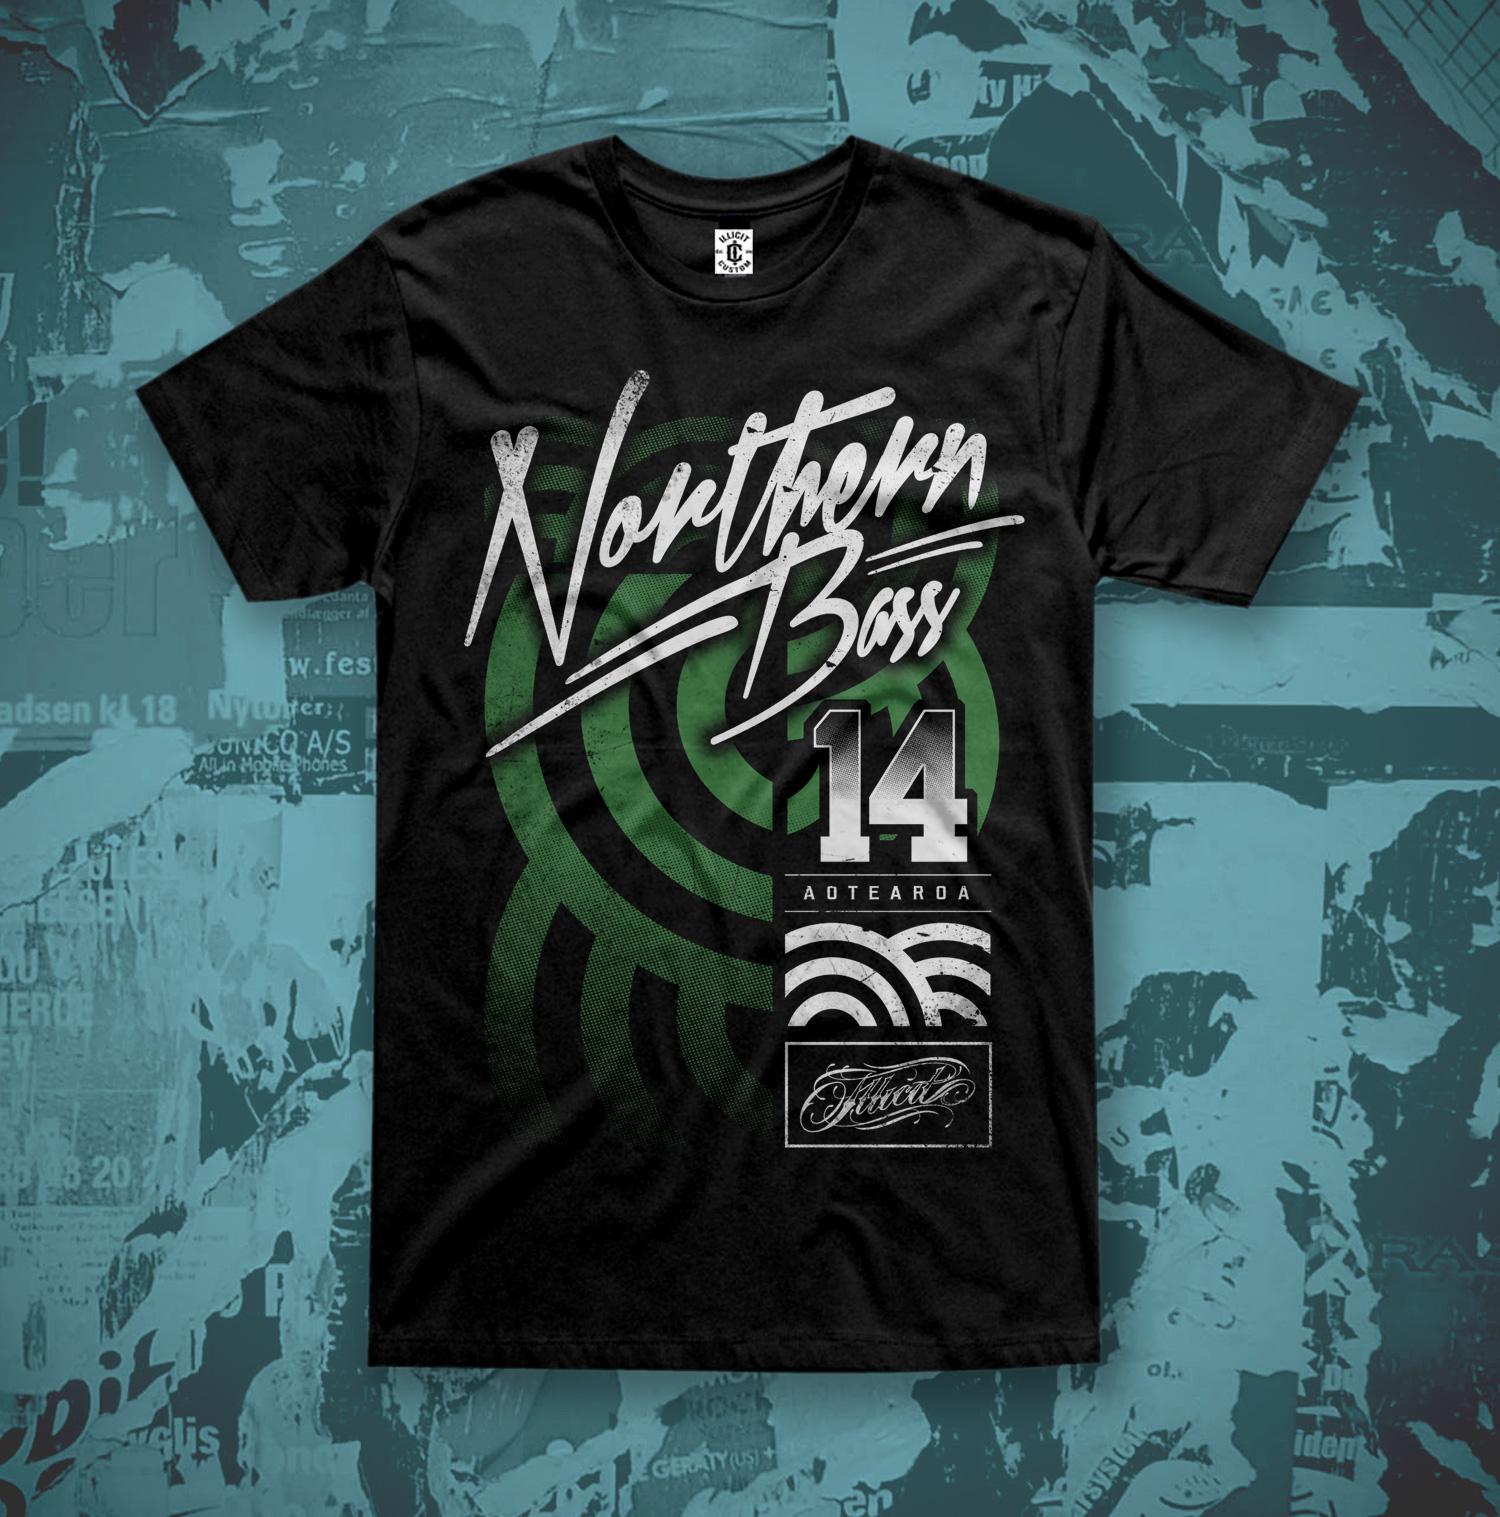 Northern Bass 3.jpg